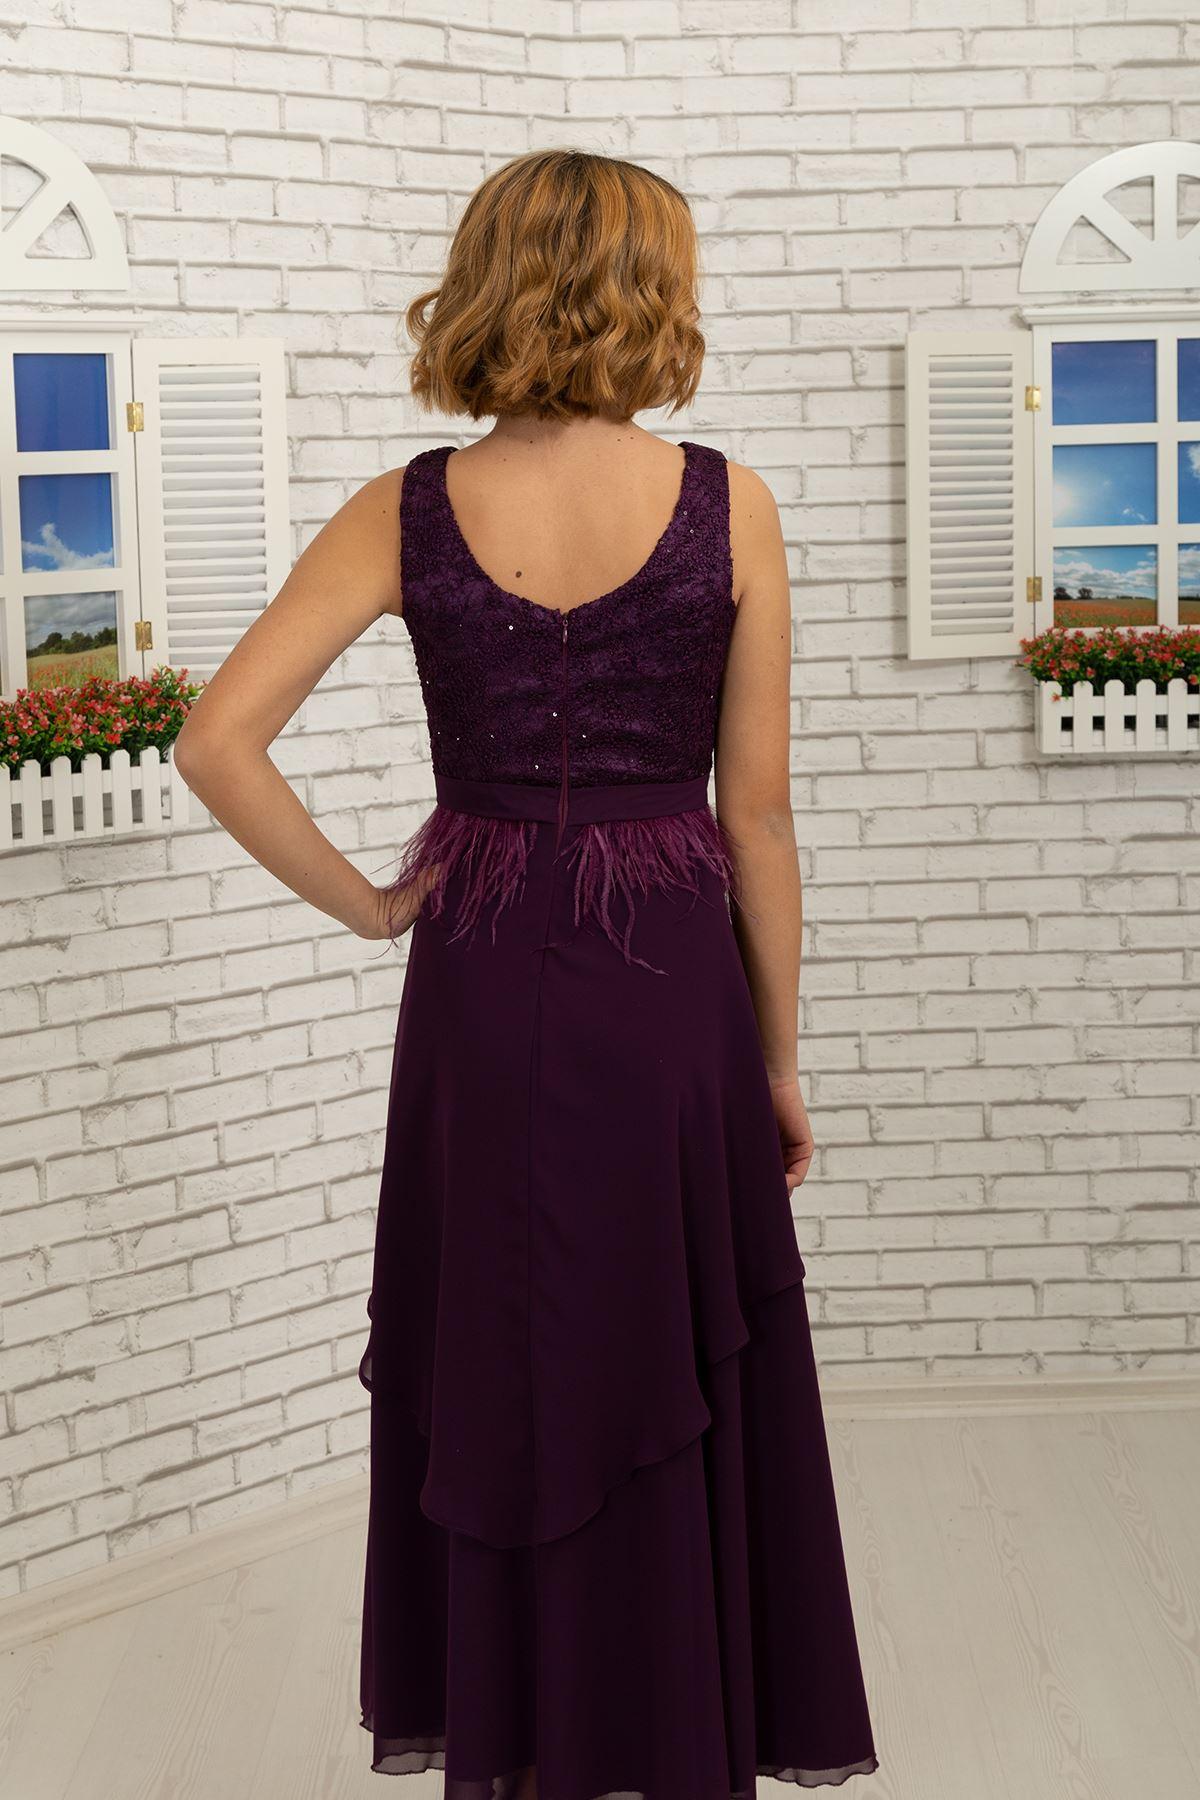 Body lace coated, skirt detailed chiffon girl children evening dress 494 Purple